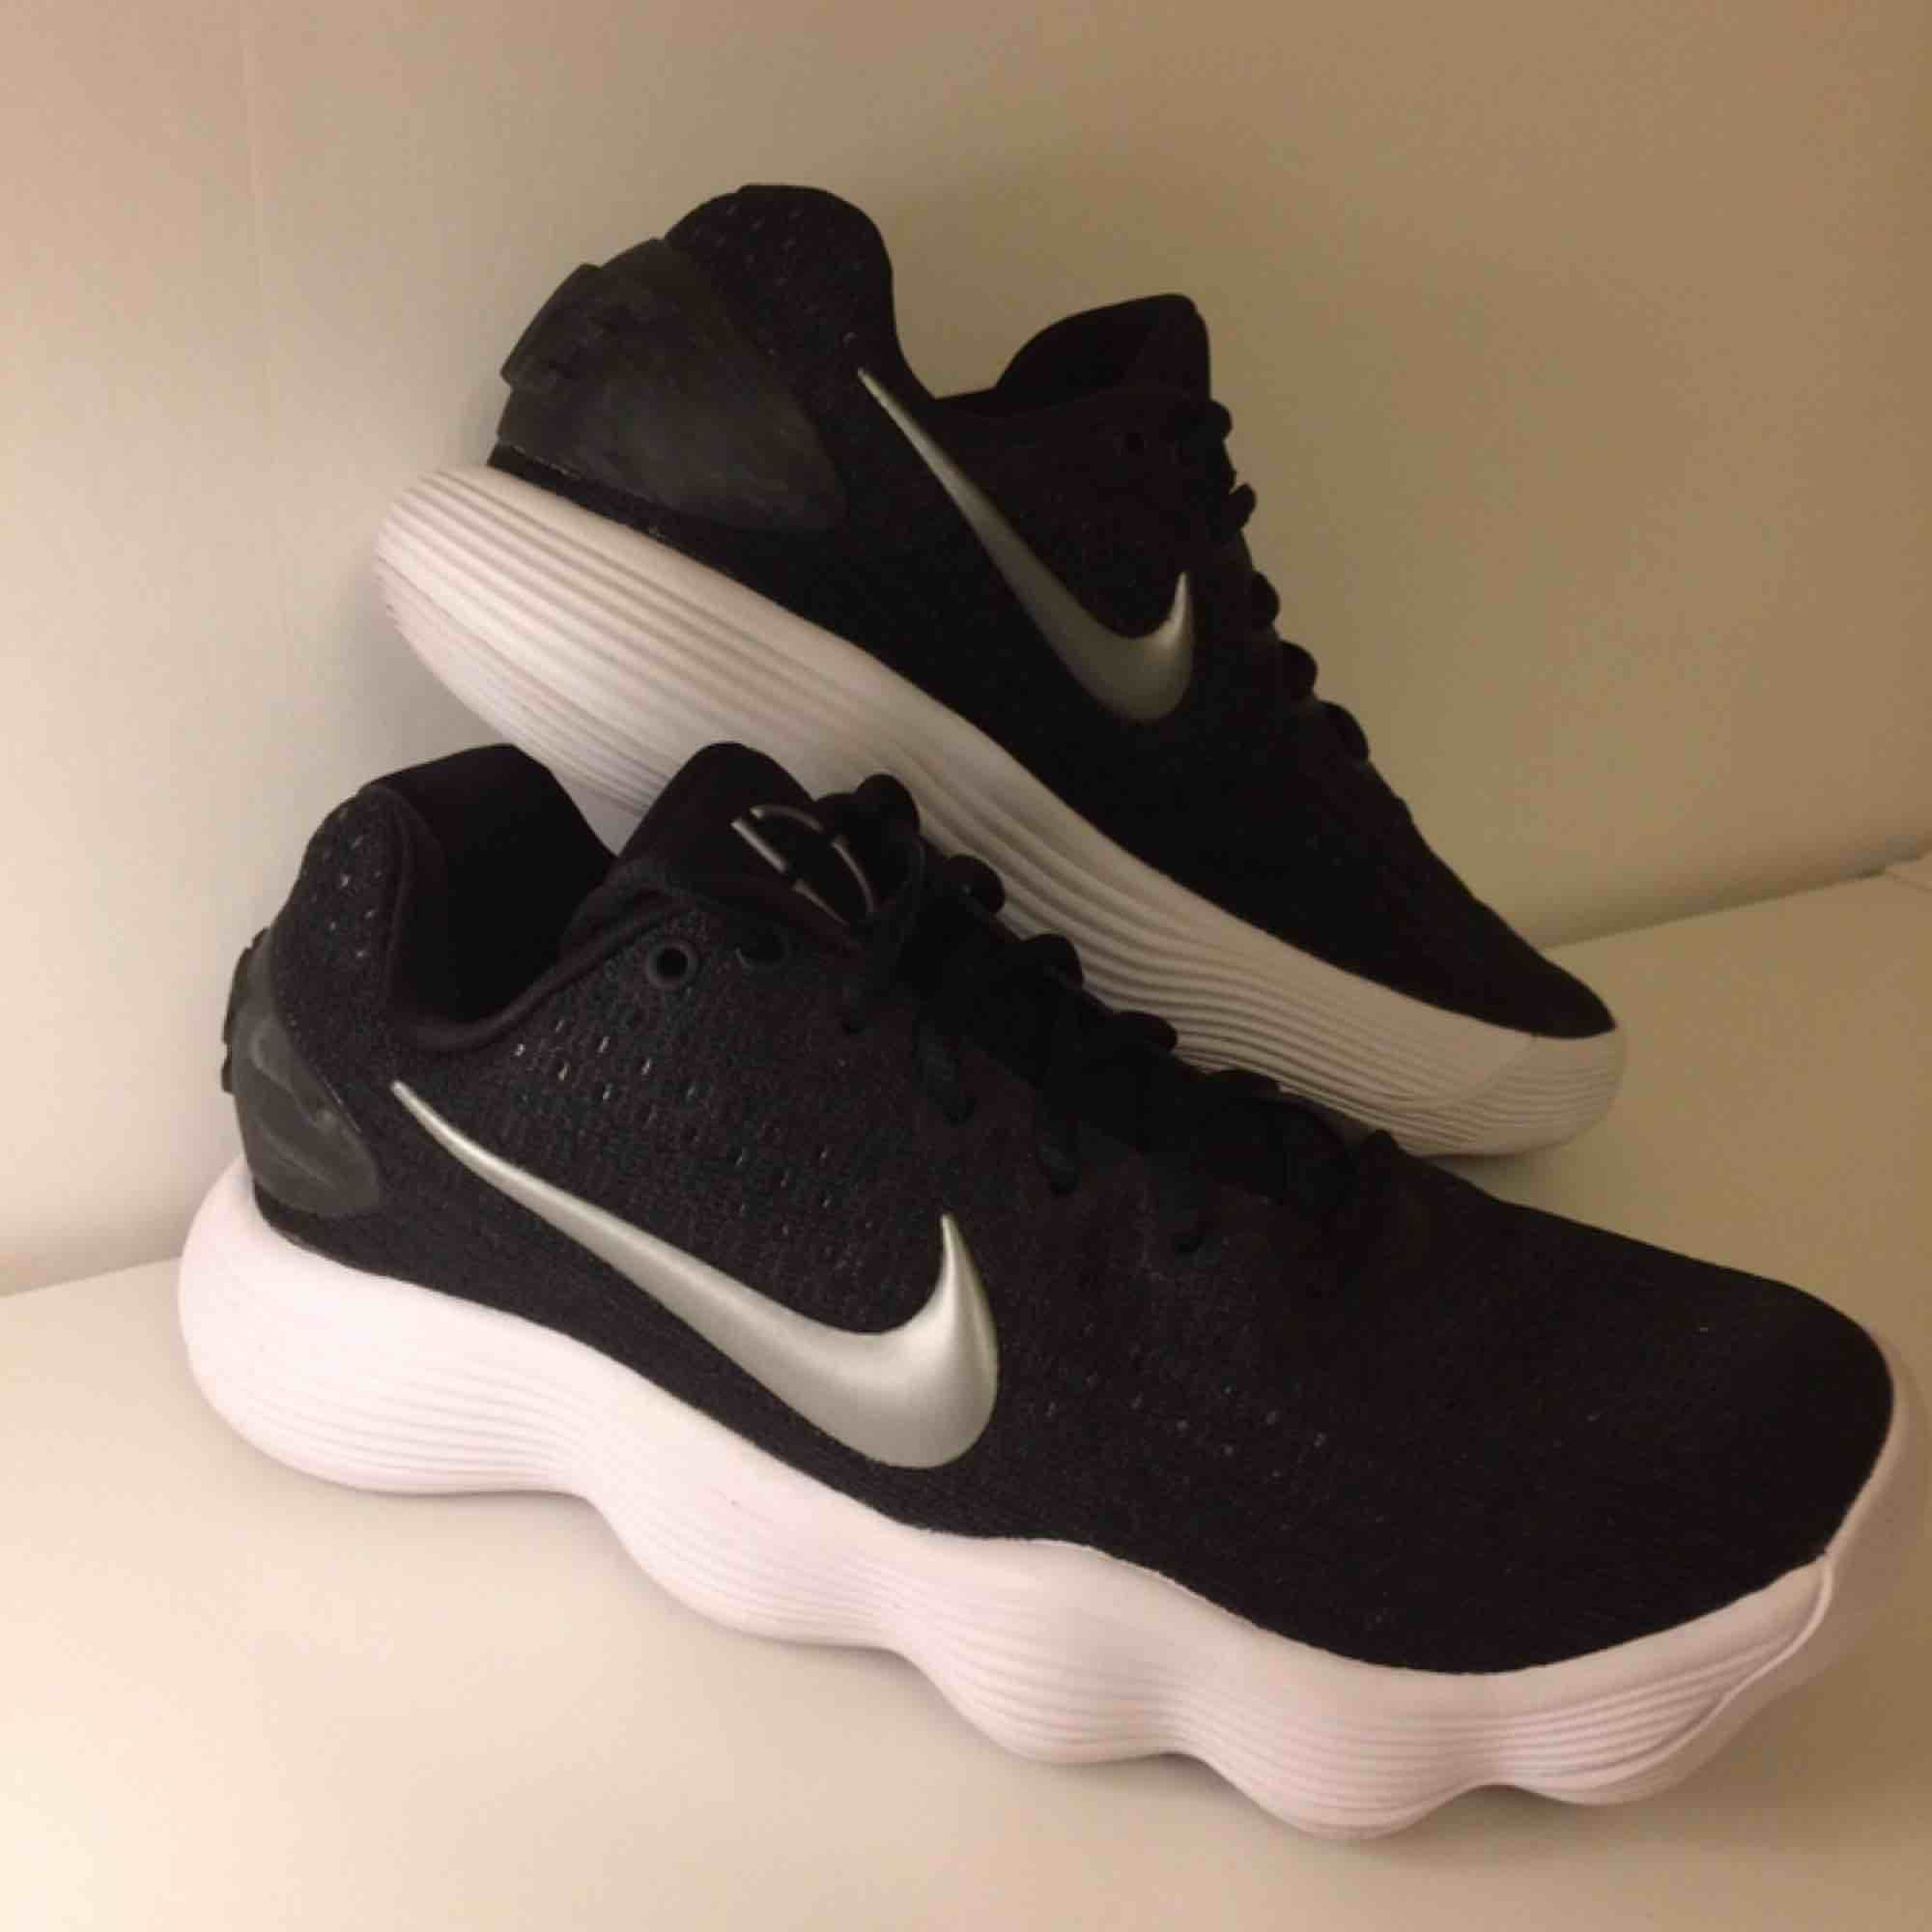 Nike Hyperdunk Low. Helt nya basketskor, storlek 38, 24 cm. Köparen står för frakt.. Skor.